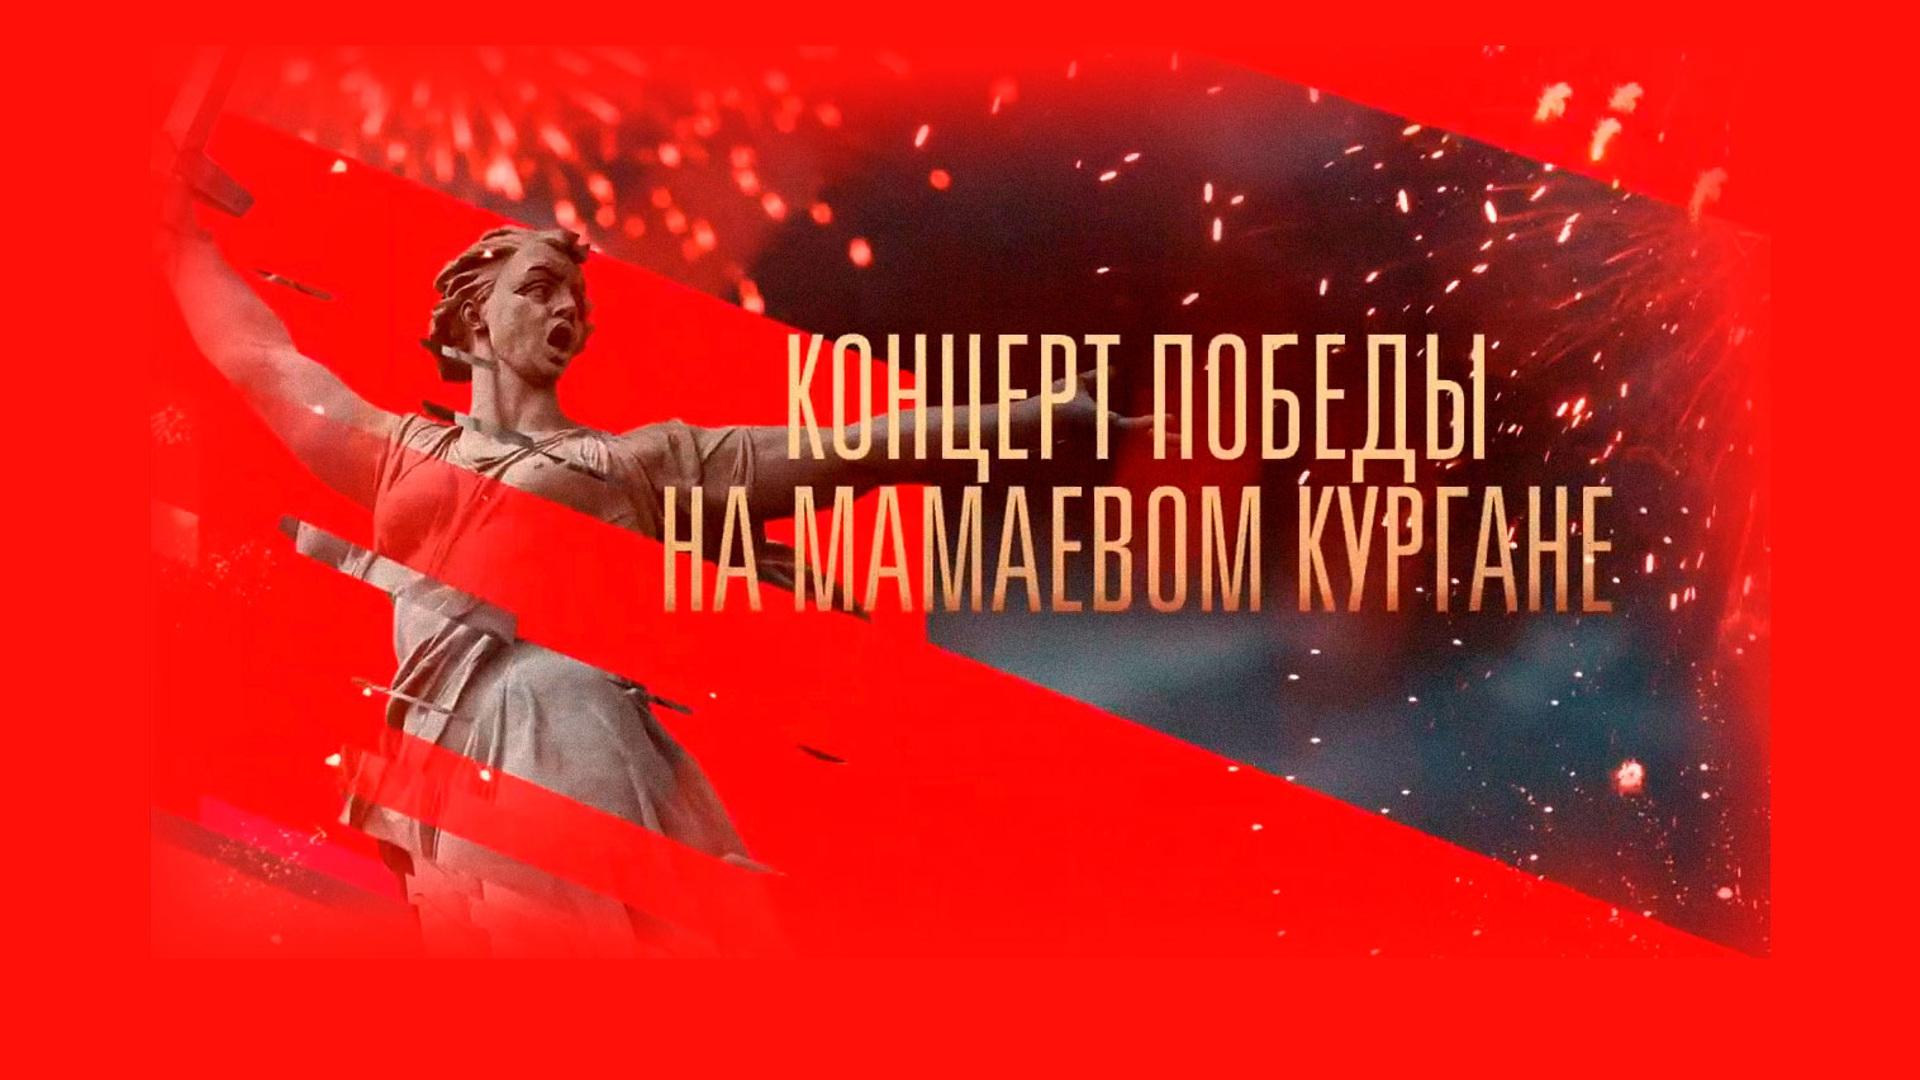 Концерт Победы на Мамаевом кургане